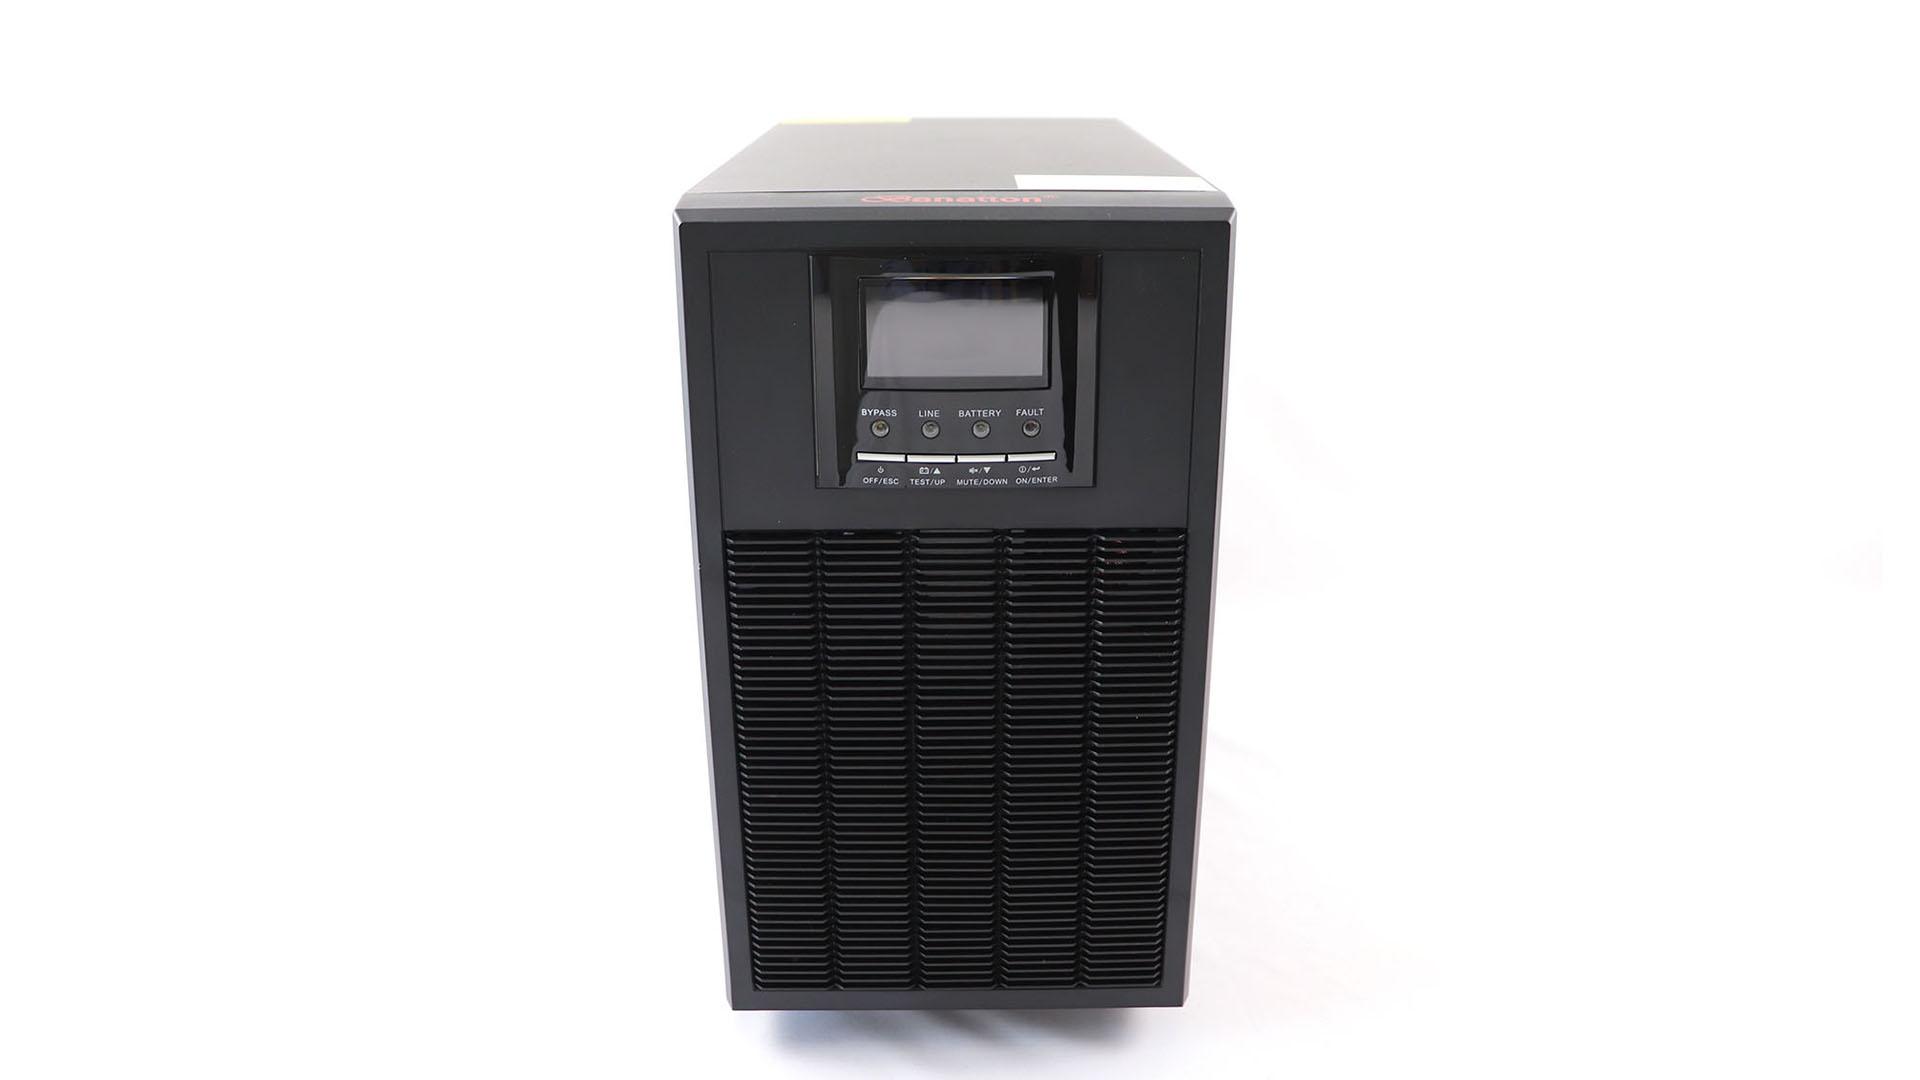 High Quality Best Online UPS 6-10 KVA UPS Wholesale-Banatton Technologies (Beijing) Co., Ltd.